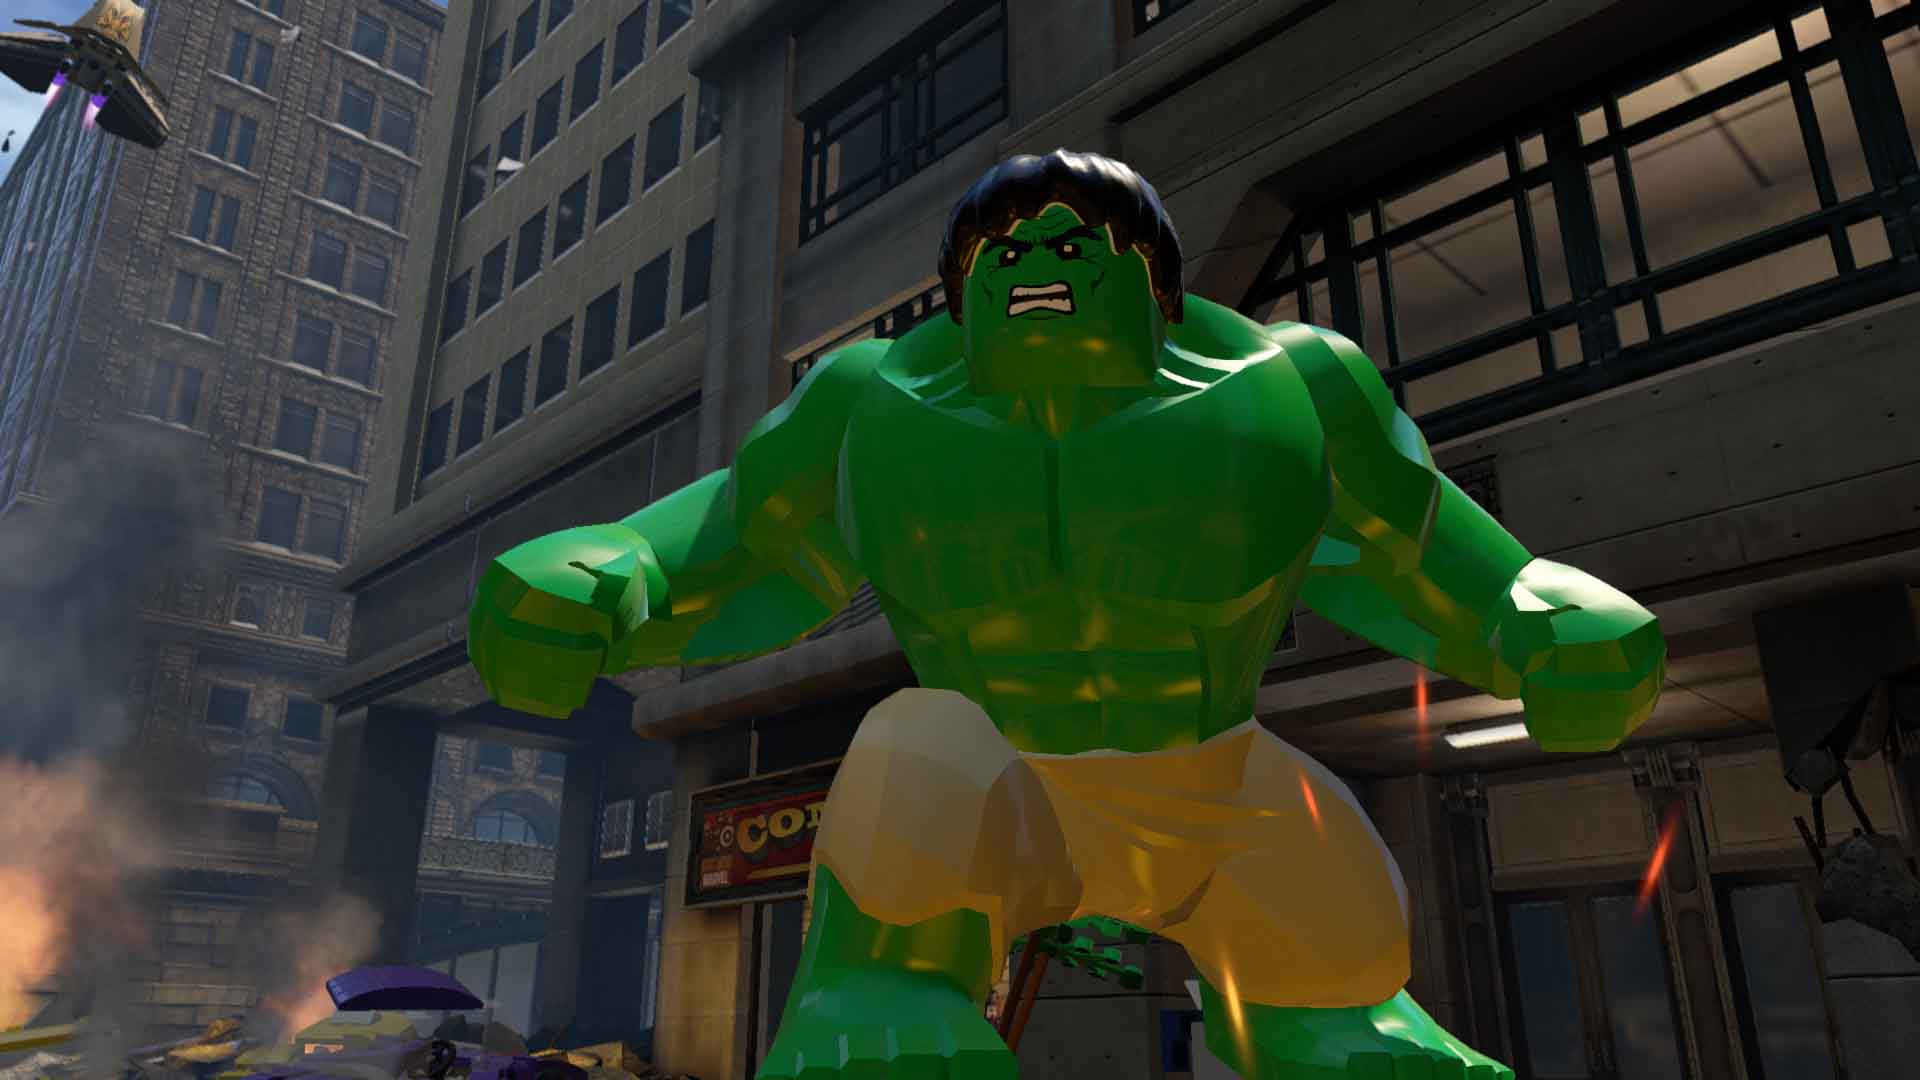 download-LEGO-MARVEL's-Avengers-hadoan-tv-1